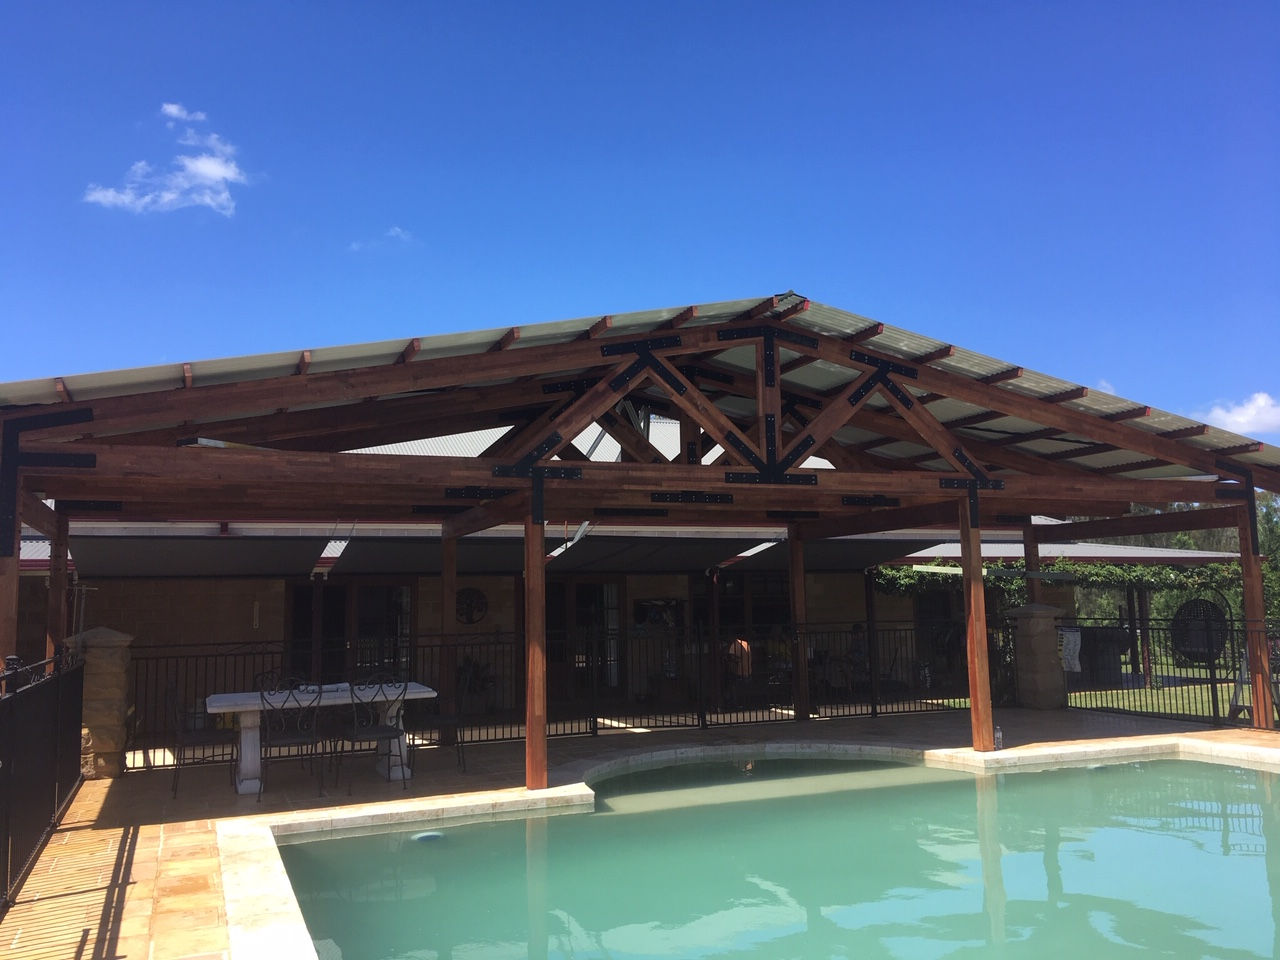 Poolside Shelter